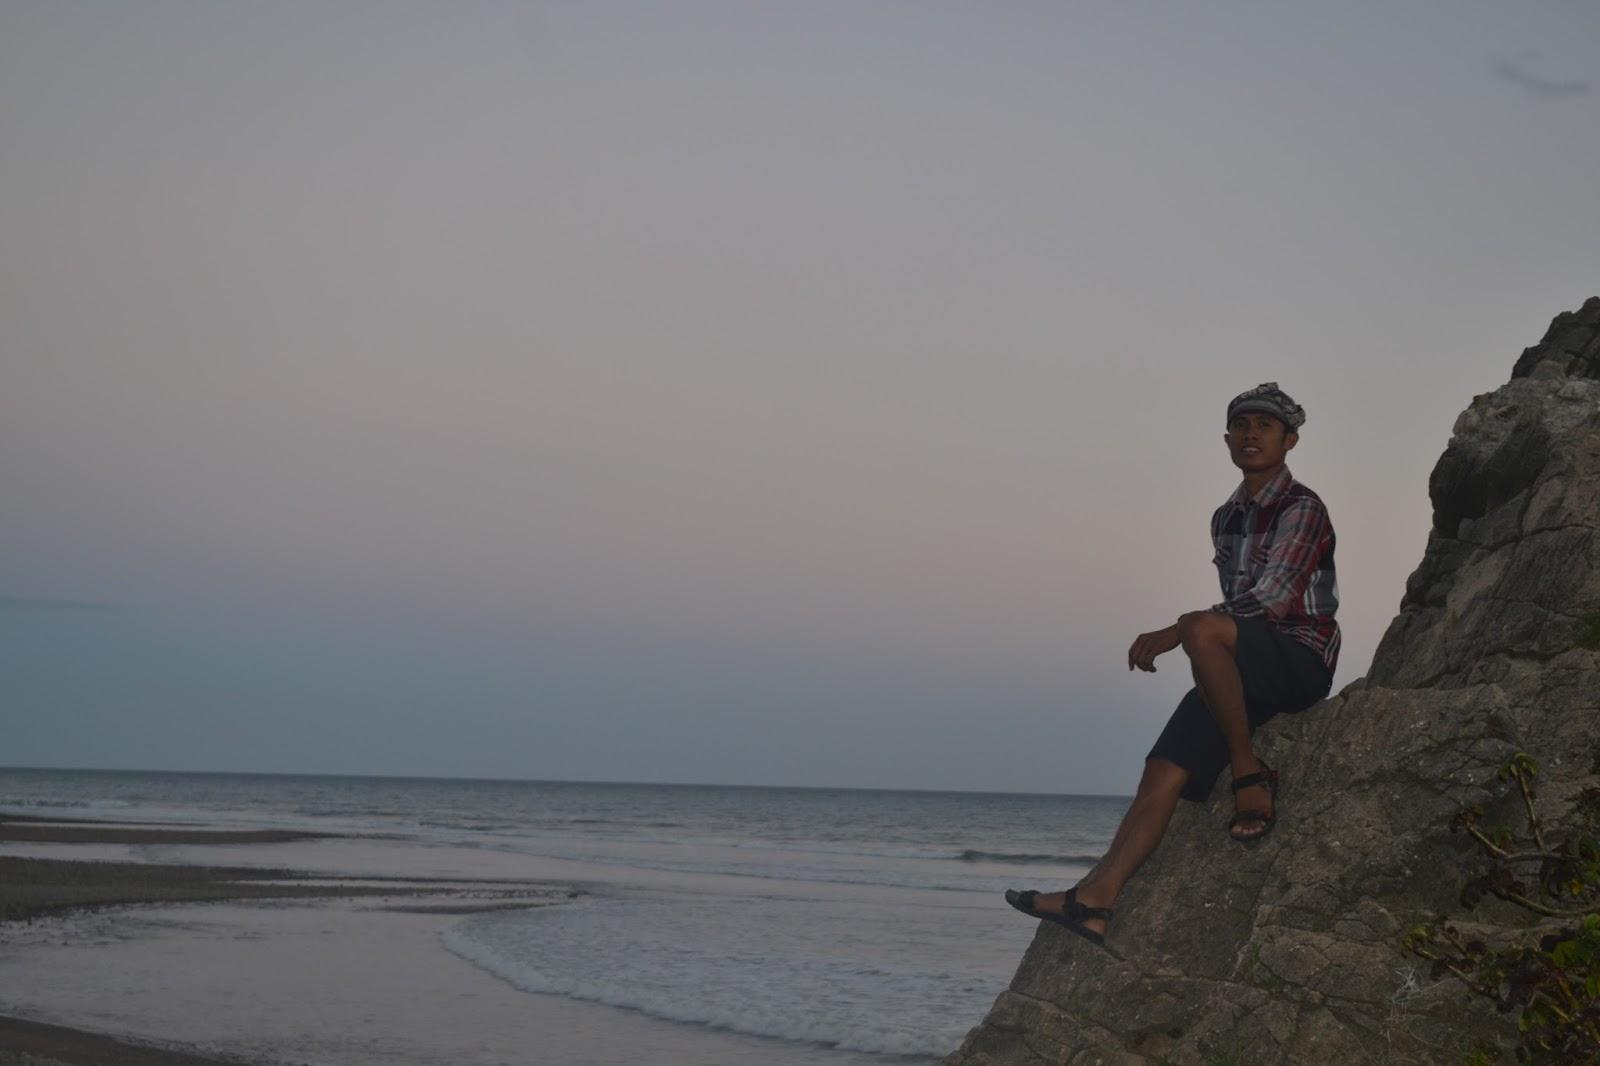 Arianto Ntt Pantai Batu Lesa Kabupaten Kupang Cabang Menuju Belok